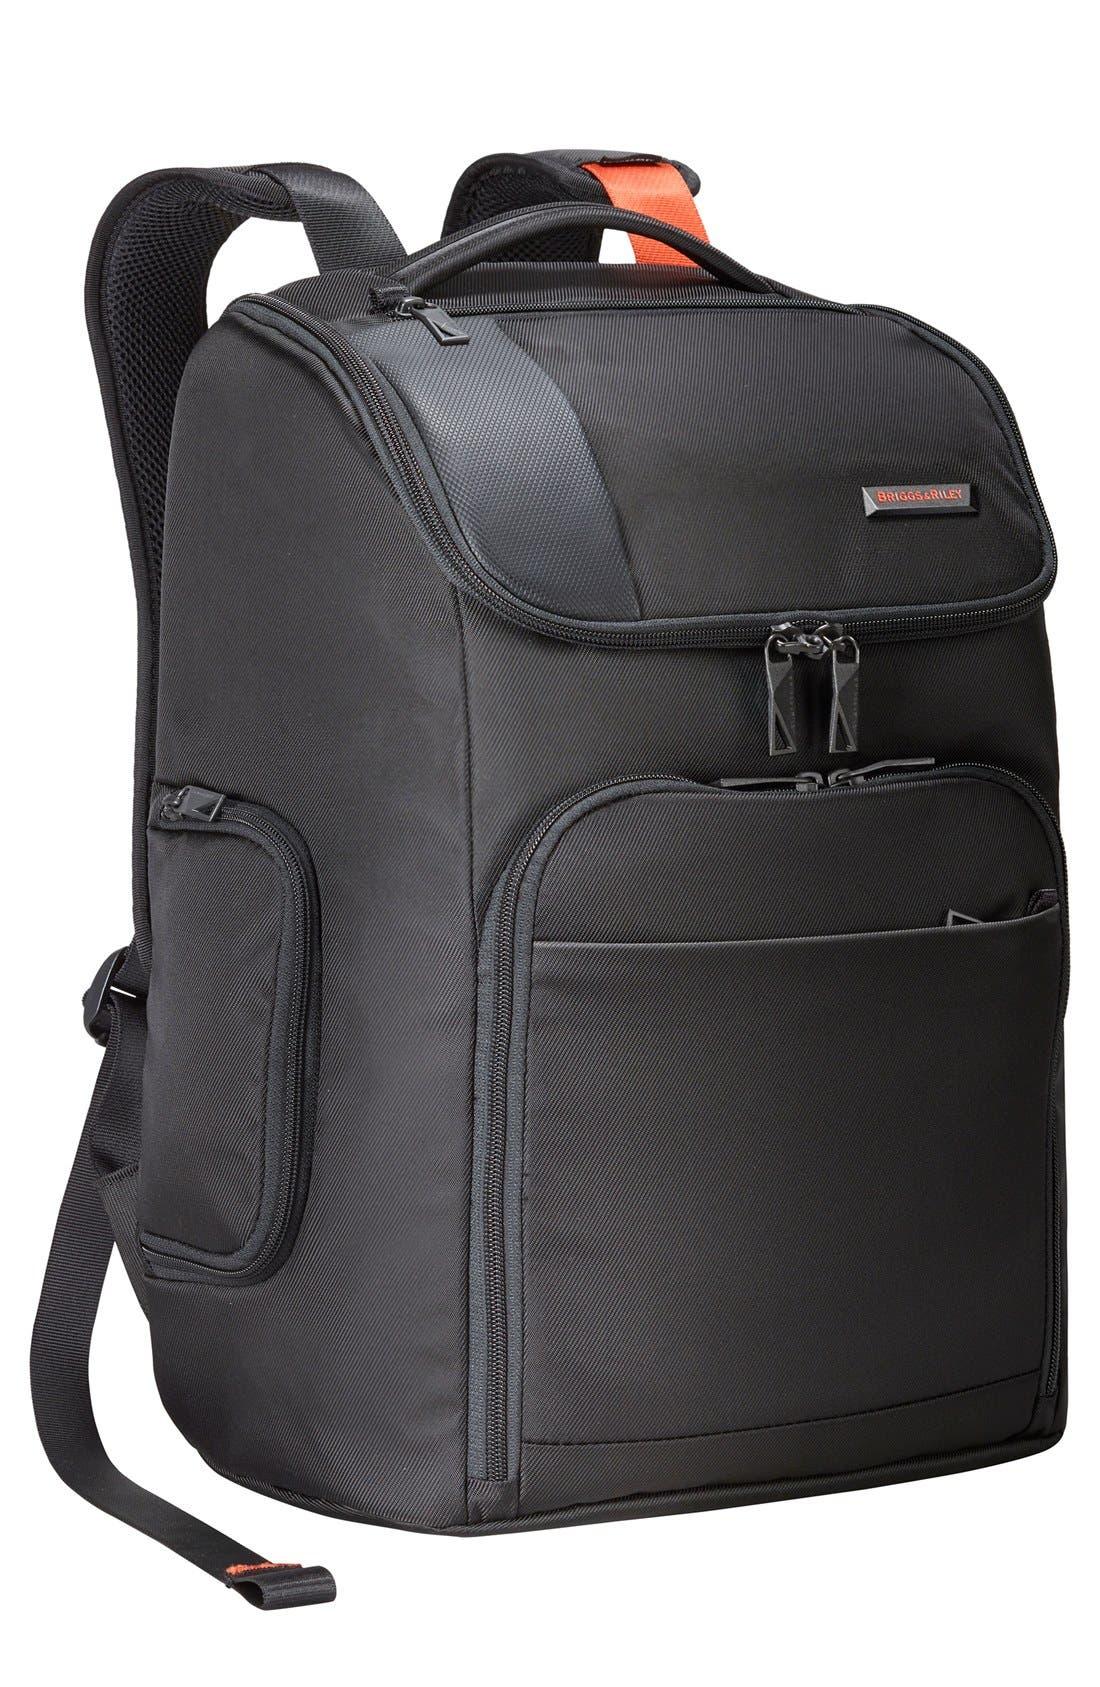 BRIGGS & RILEY, Verb - Advance Water & Wear Resistant Ballistic Nylon Backpack, Main thumbnail 1, color, BLACK